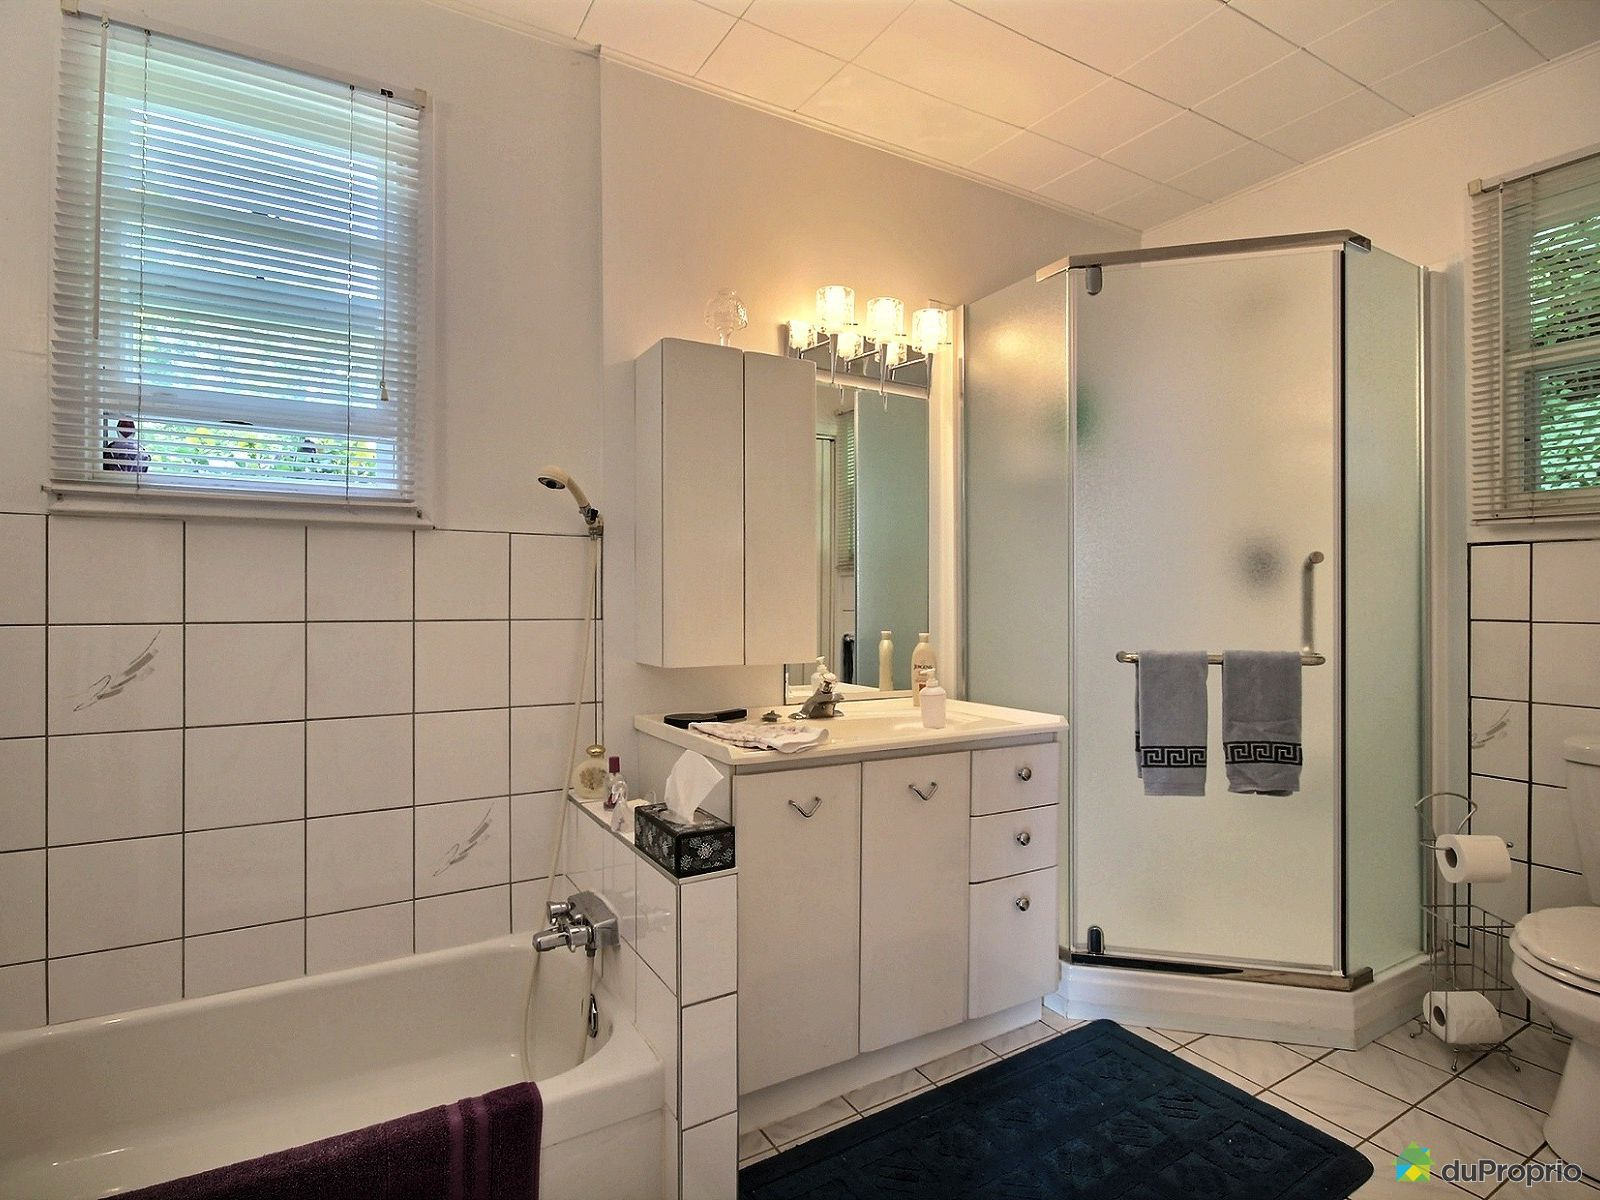 chalet vendre ile d 39 orl ans st laurent 192 c te gosselin immobilier qu bec duproprio 711115. Black Bedroom Furniture Sets. Home Design Ideas